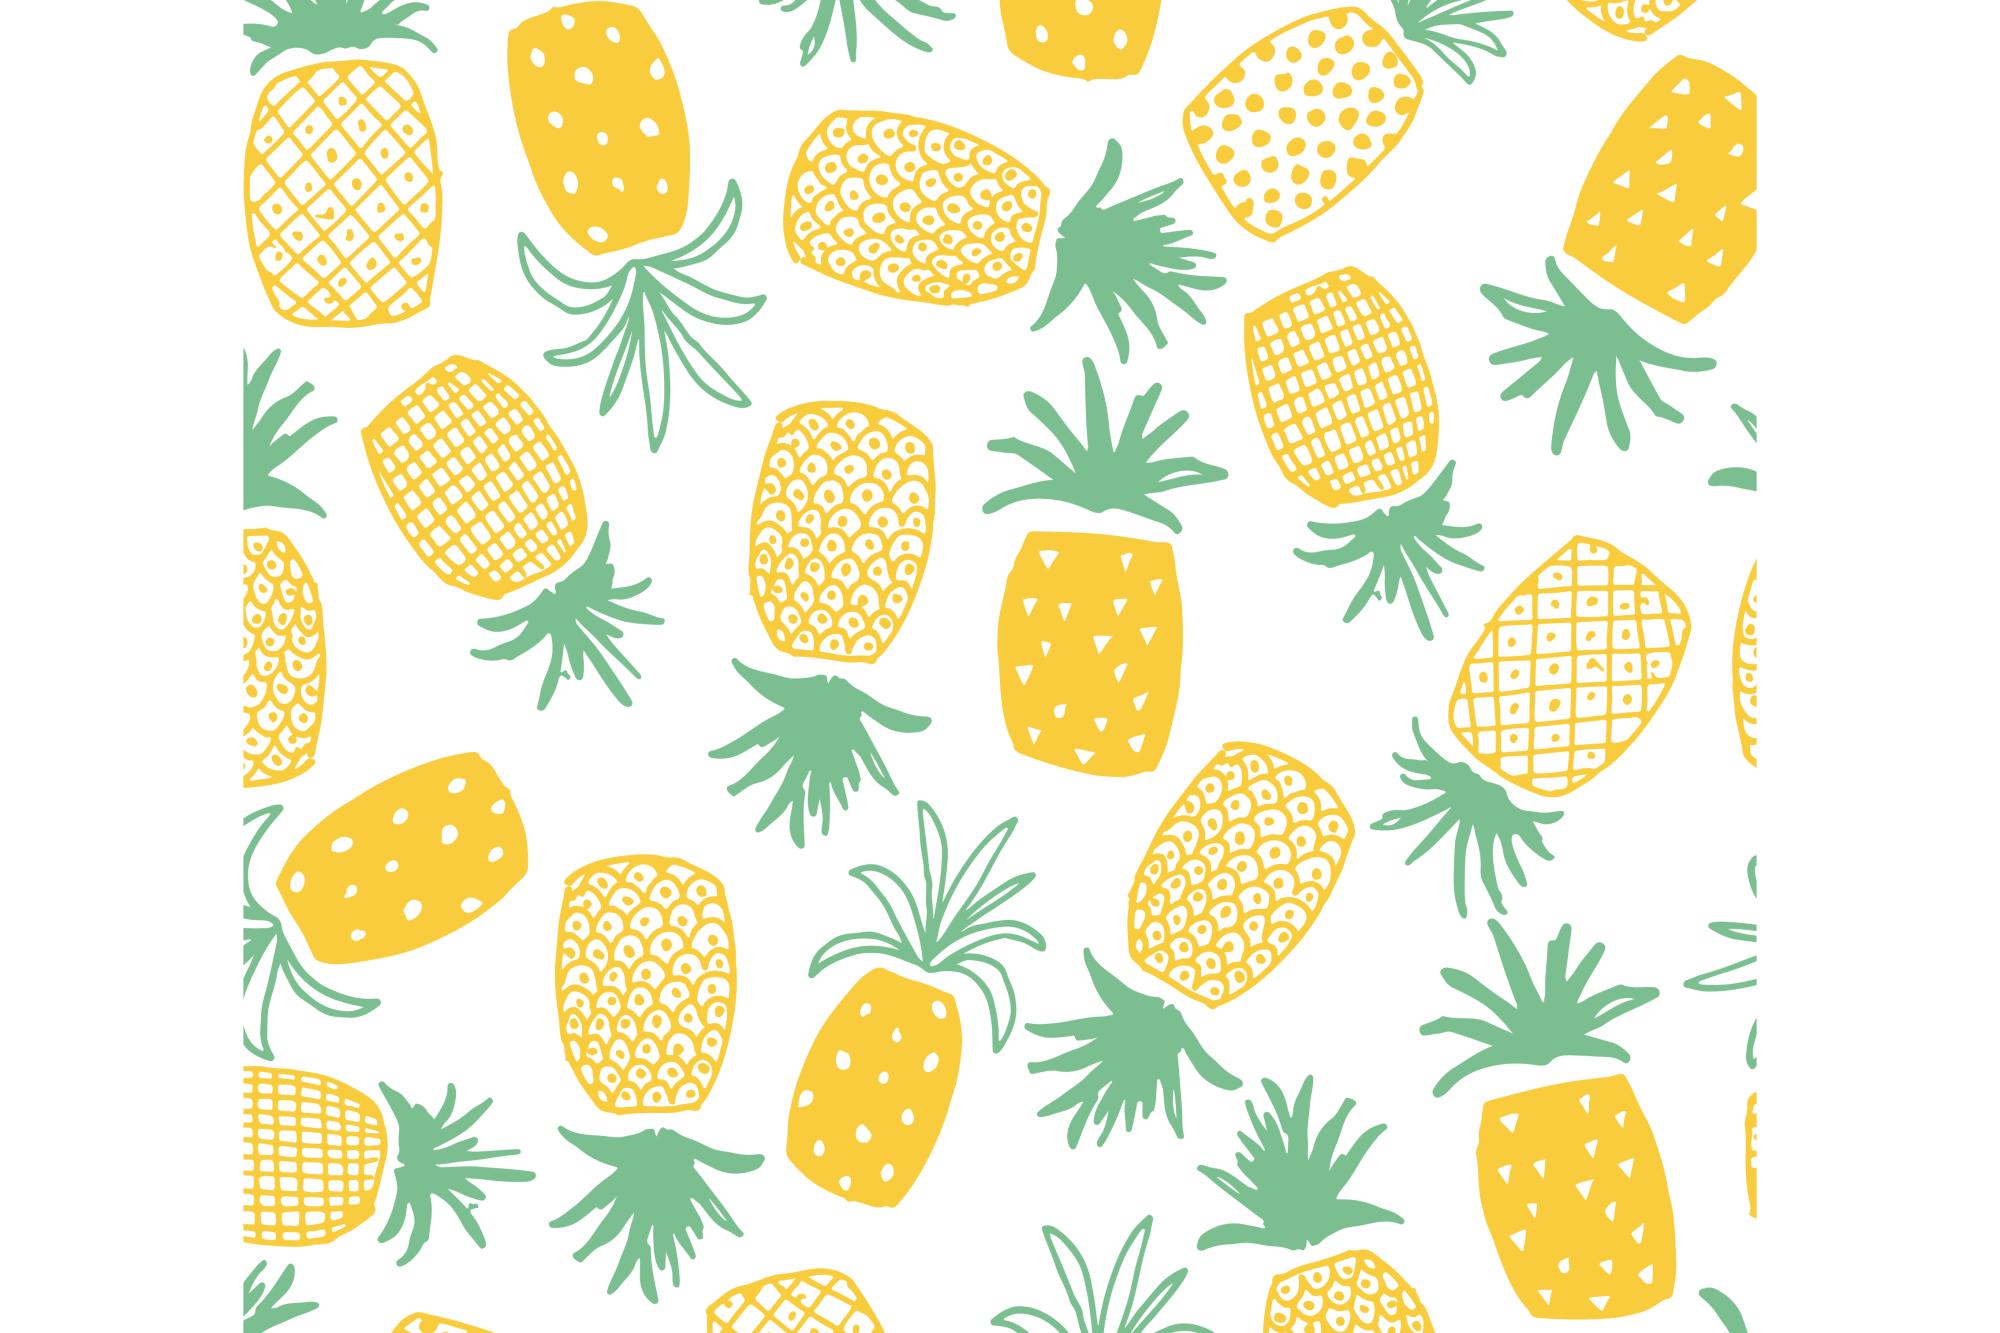 Pineapple Print Seamless Pattern example image 1